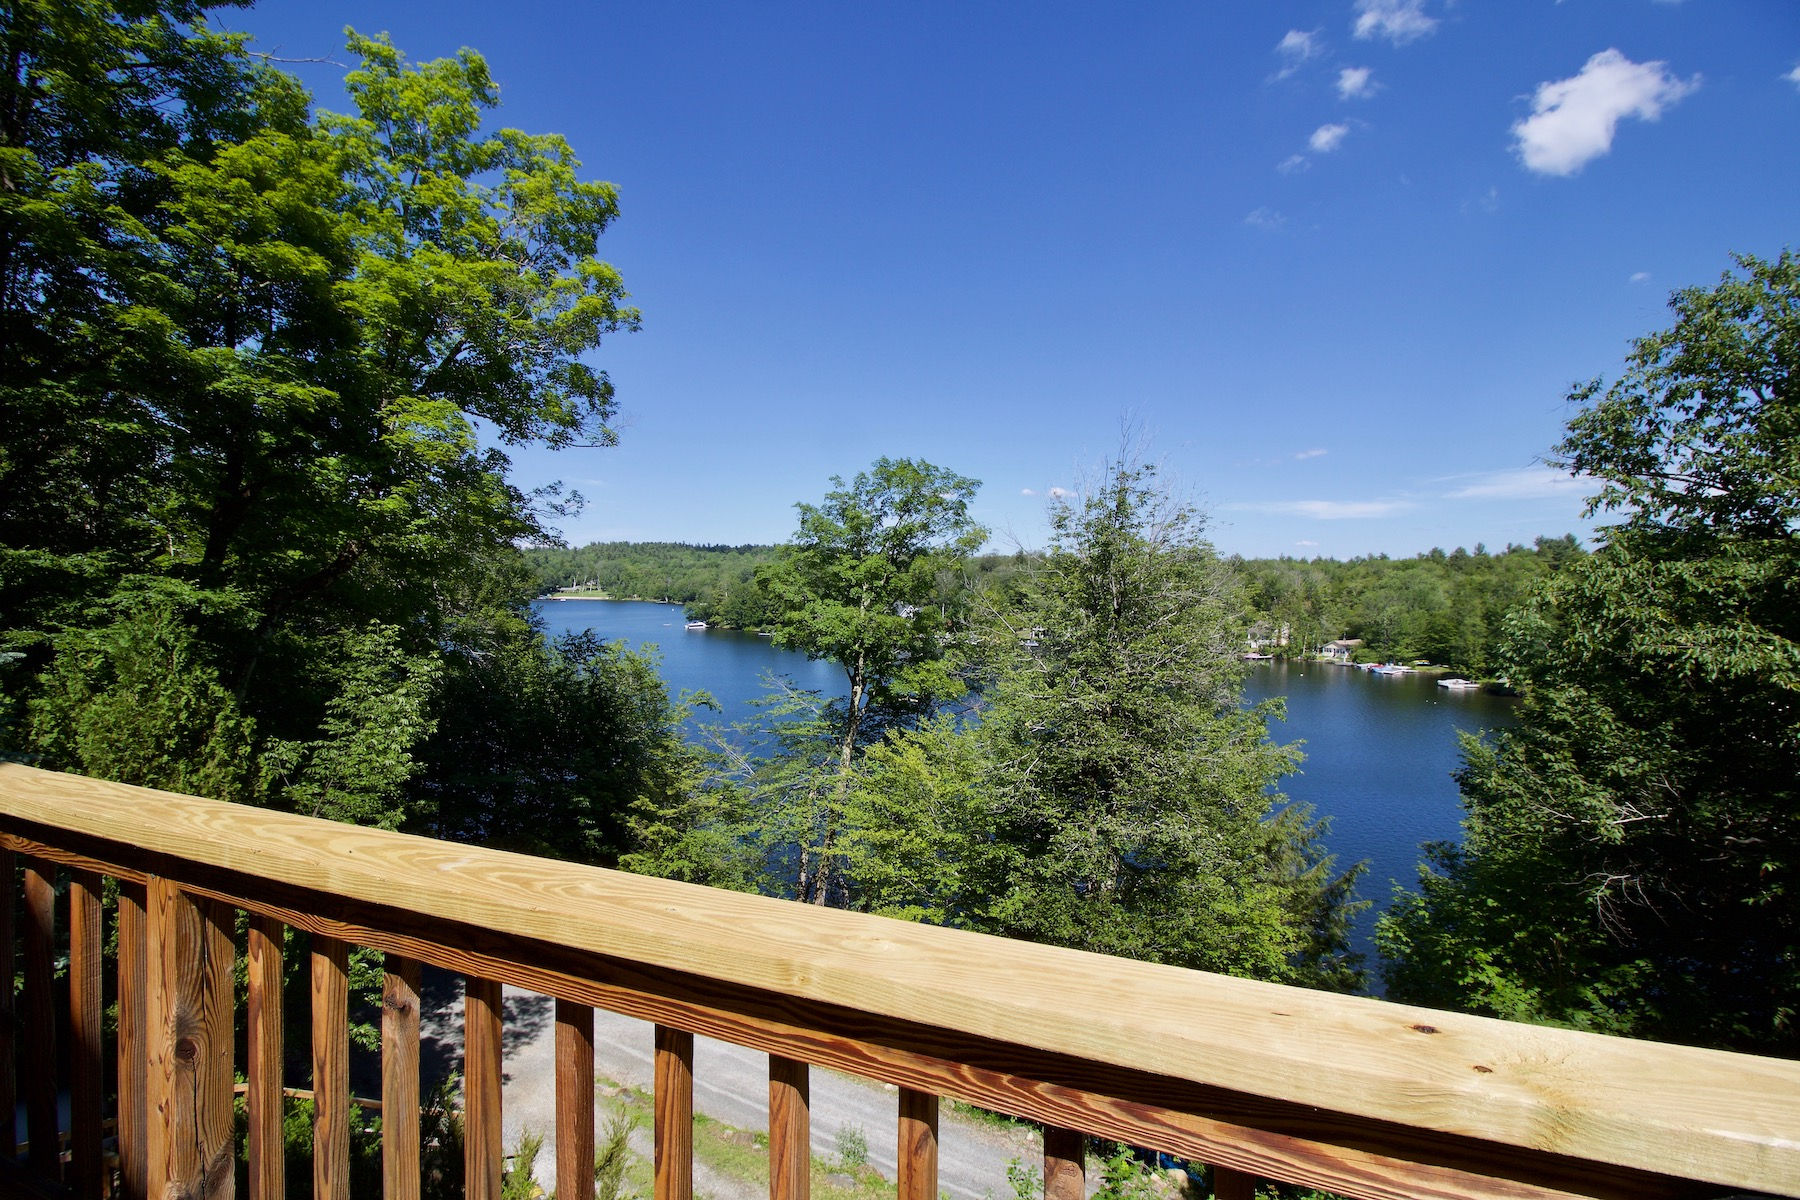 Single Family Homes για την Πώληση στο Stunning Waterfront Home with Breathtaking Views of Becket's Premier Lake! 229 South Cove Dr, Becket, Μασαχουσετη 01223 Ηνωμένες Πολιτείες